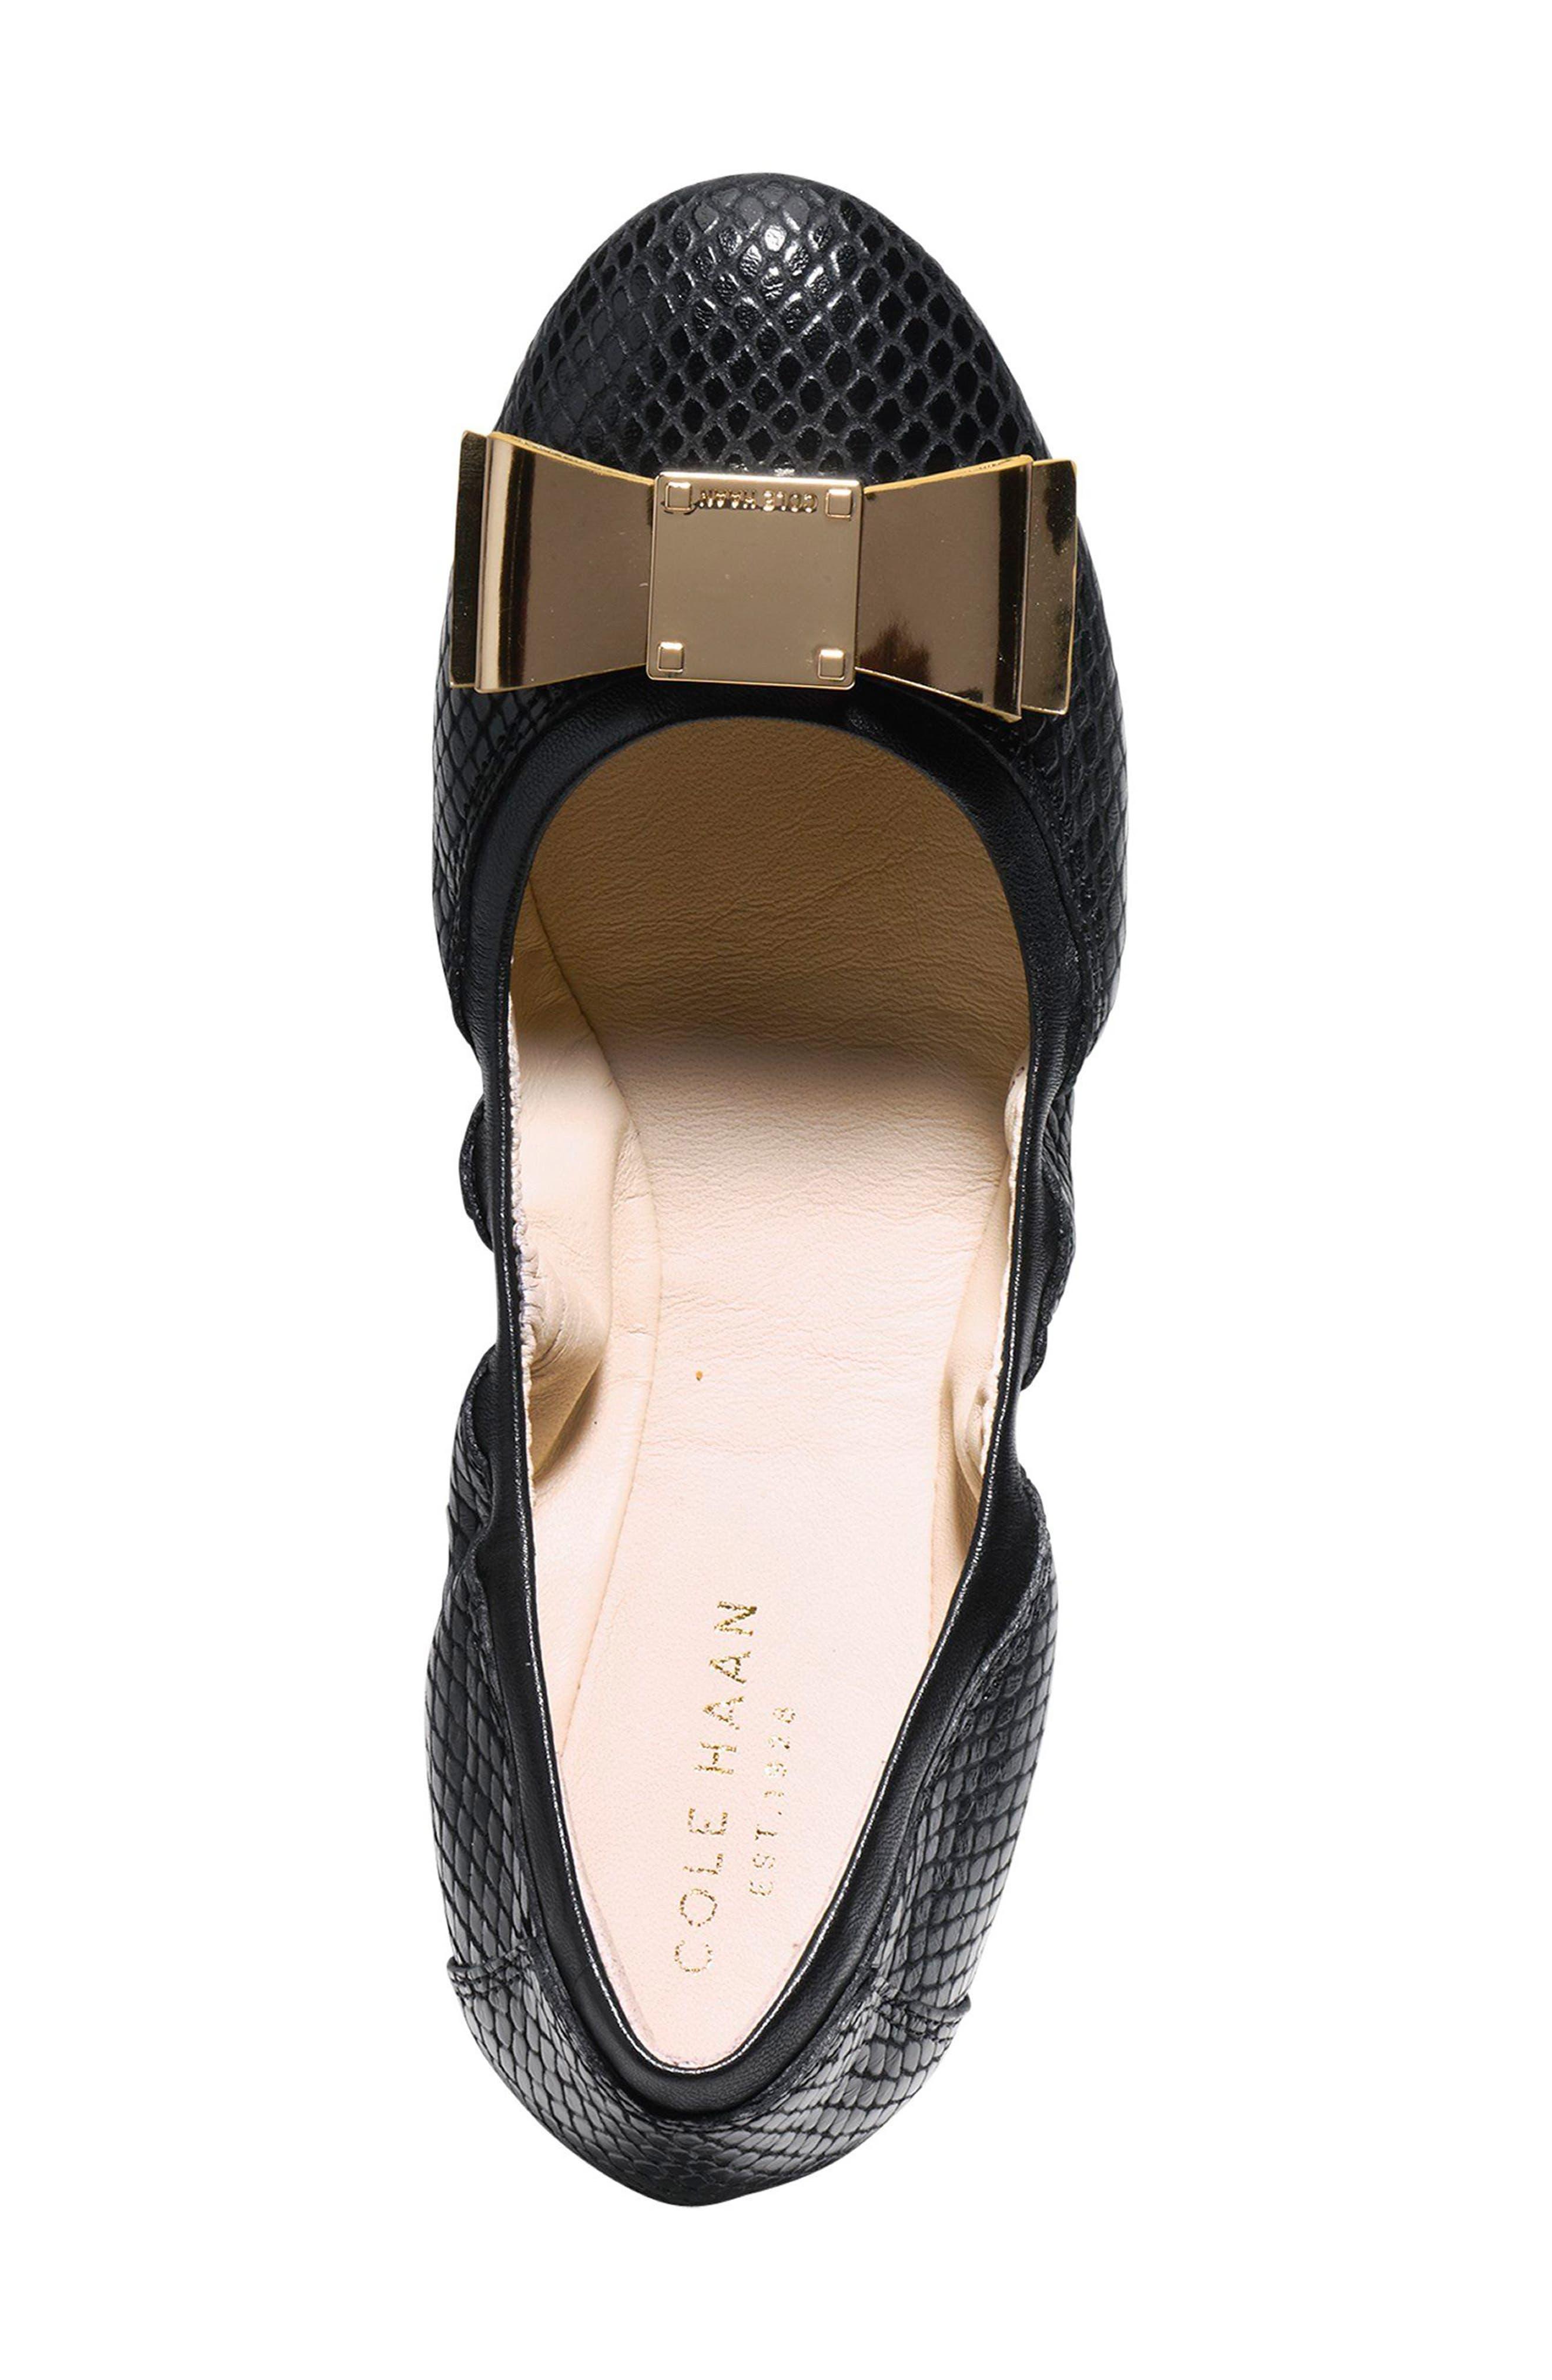 'Tali' Bow Ballet Flat,                             Alternate thumbnail 4, color,                             Black Snake Print Leather